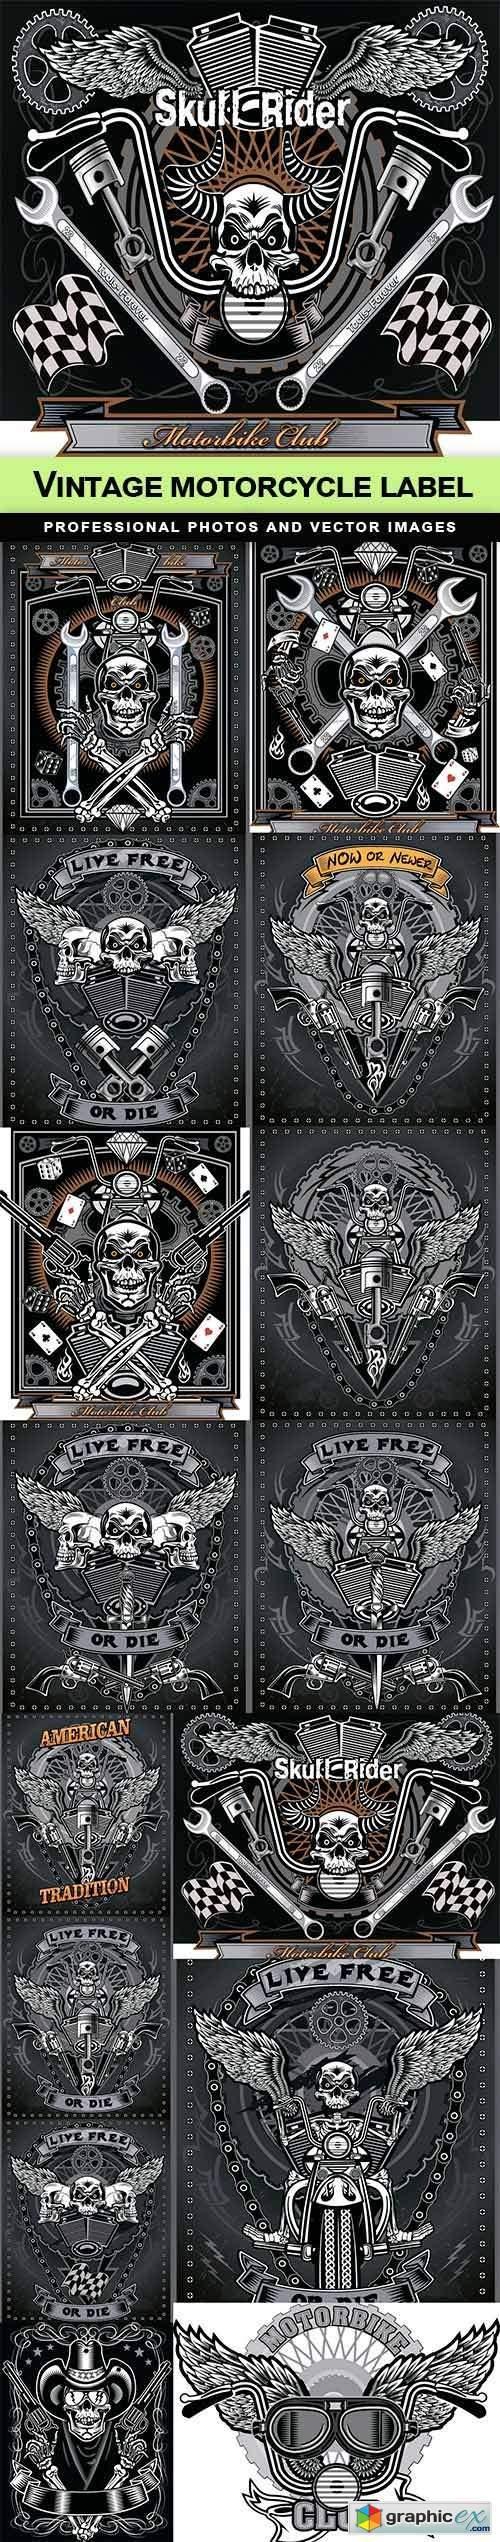 Vintage motorcycle label - 15 EPS